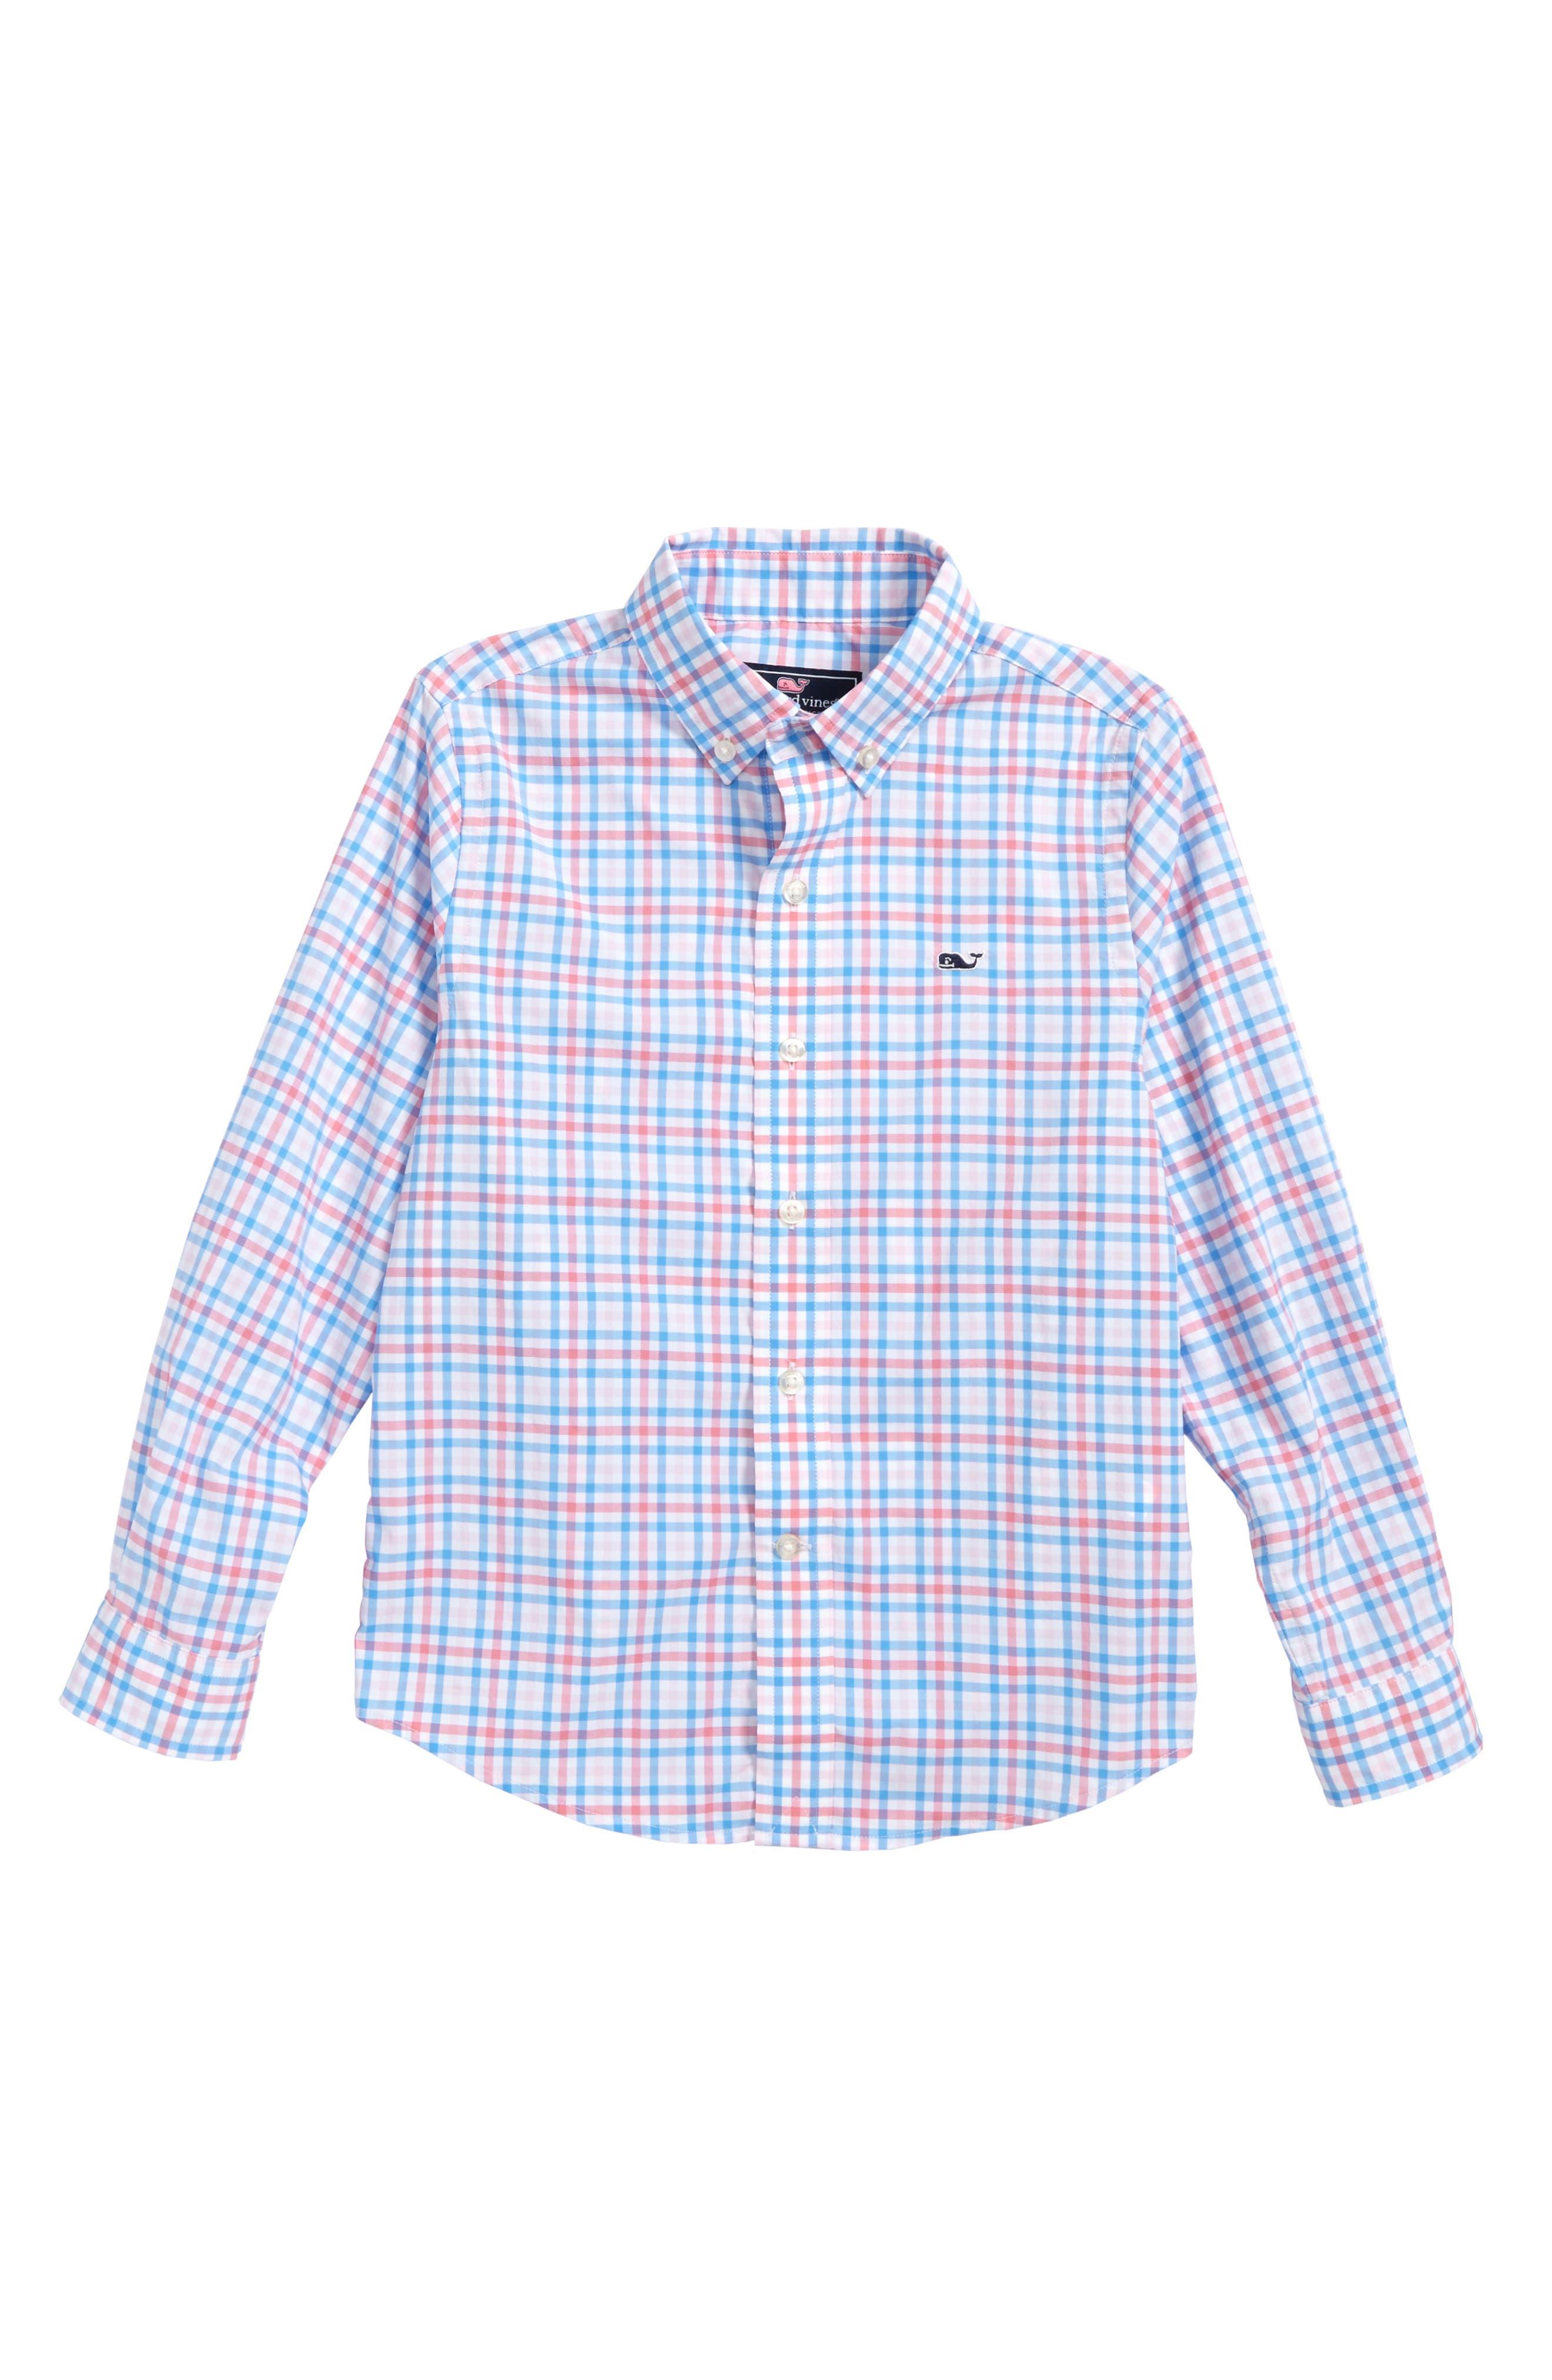 Gulf Shore Gingham Performance Woven Shirt,                             Main thumbnail 1, color,                             Bahama Breeze